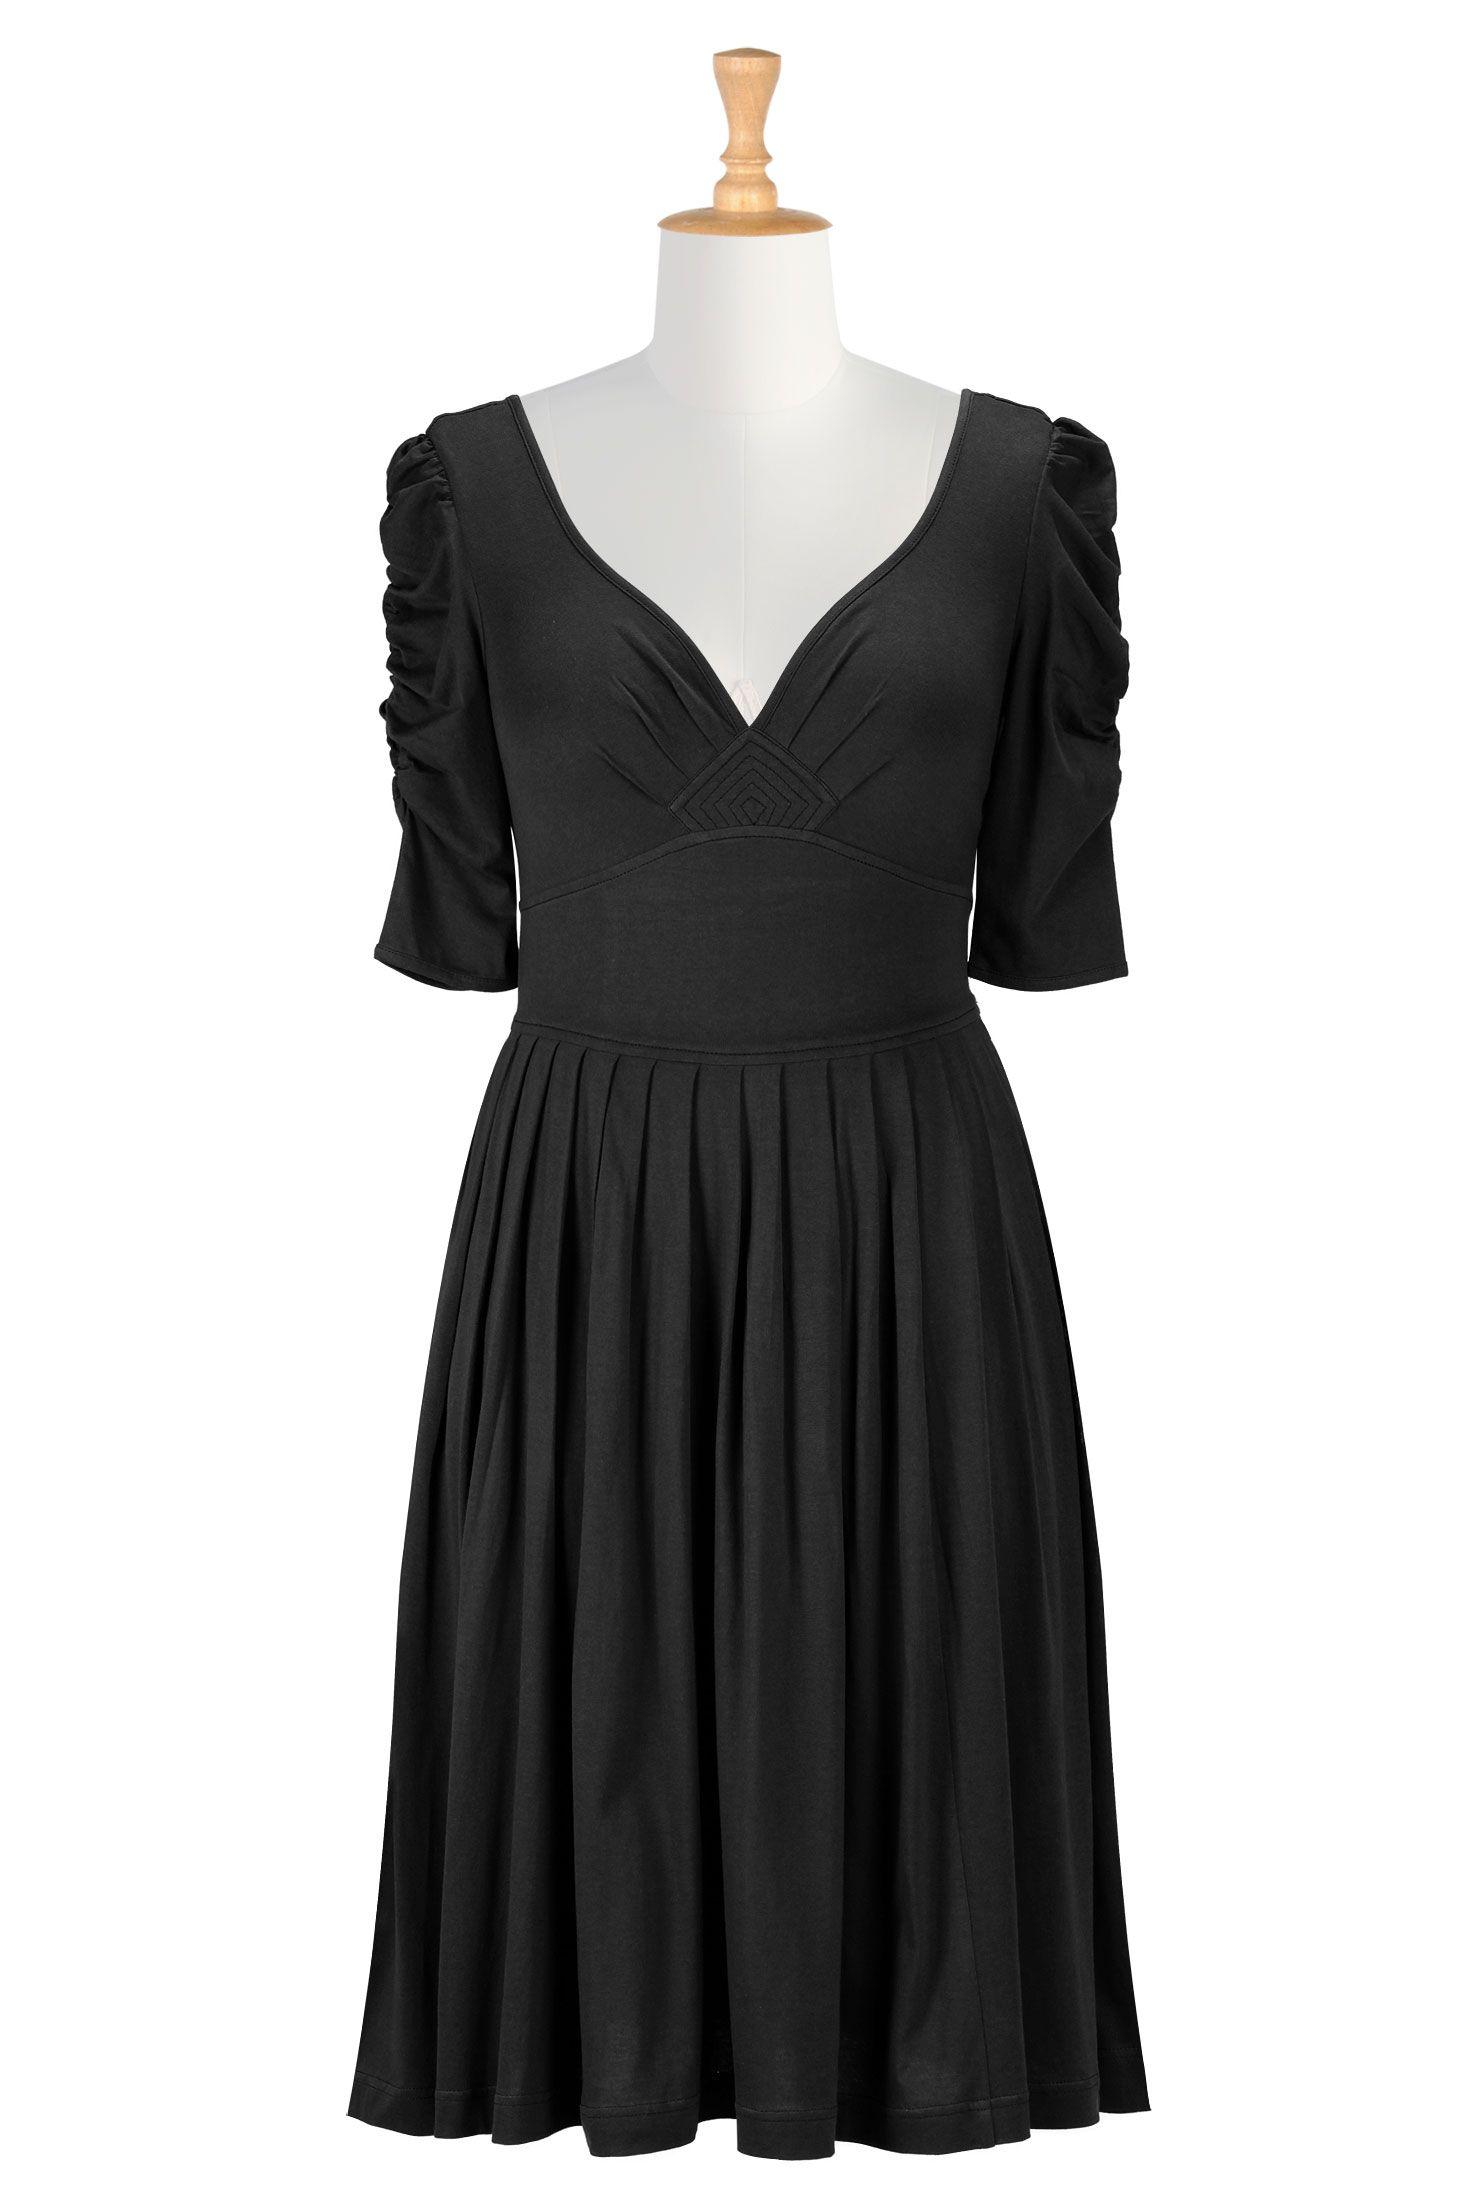 Below knee length dresses black dresses cotton dresses elbow